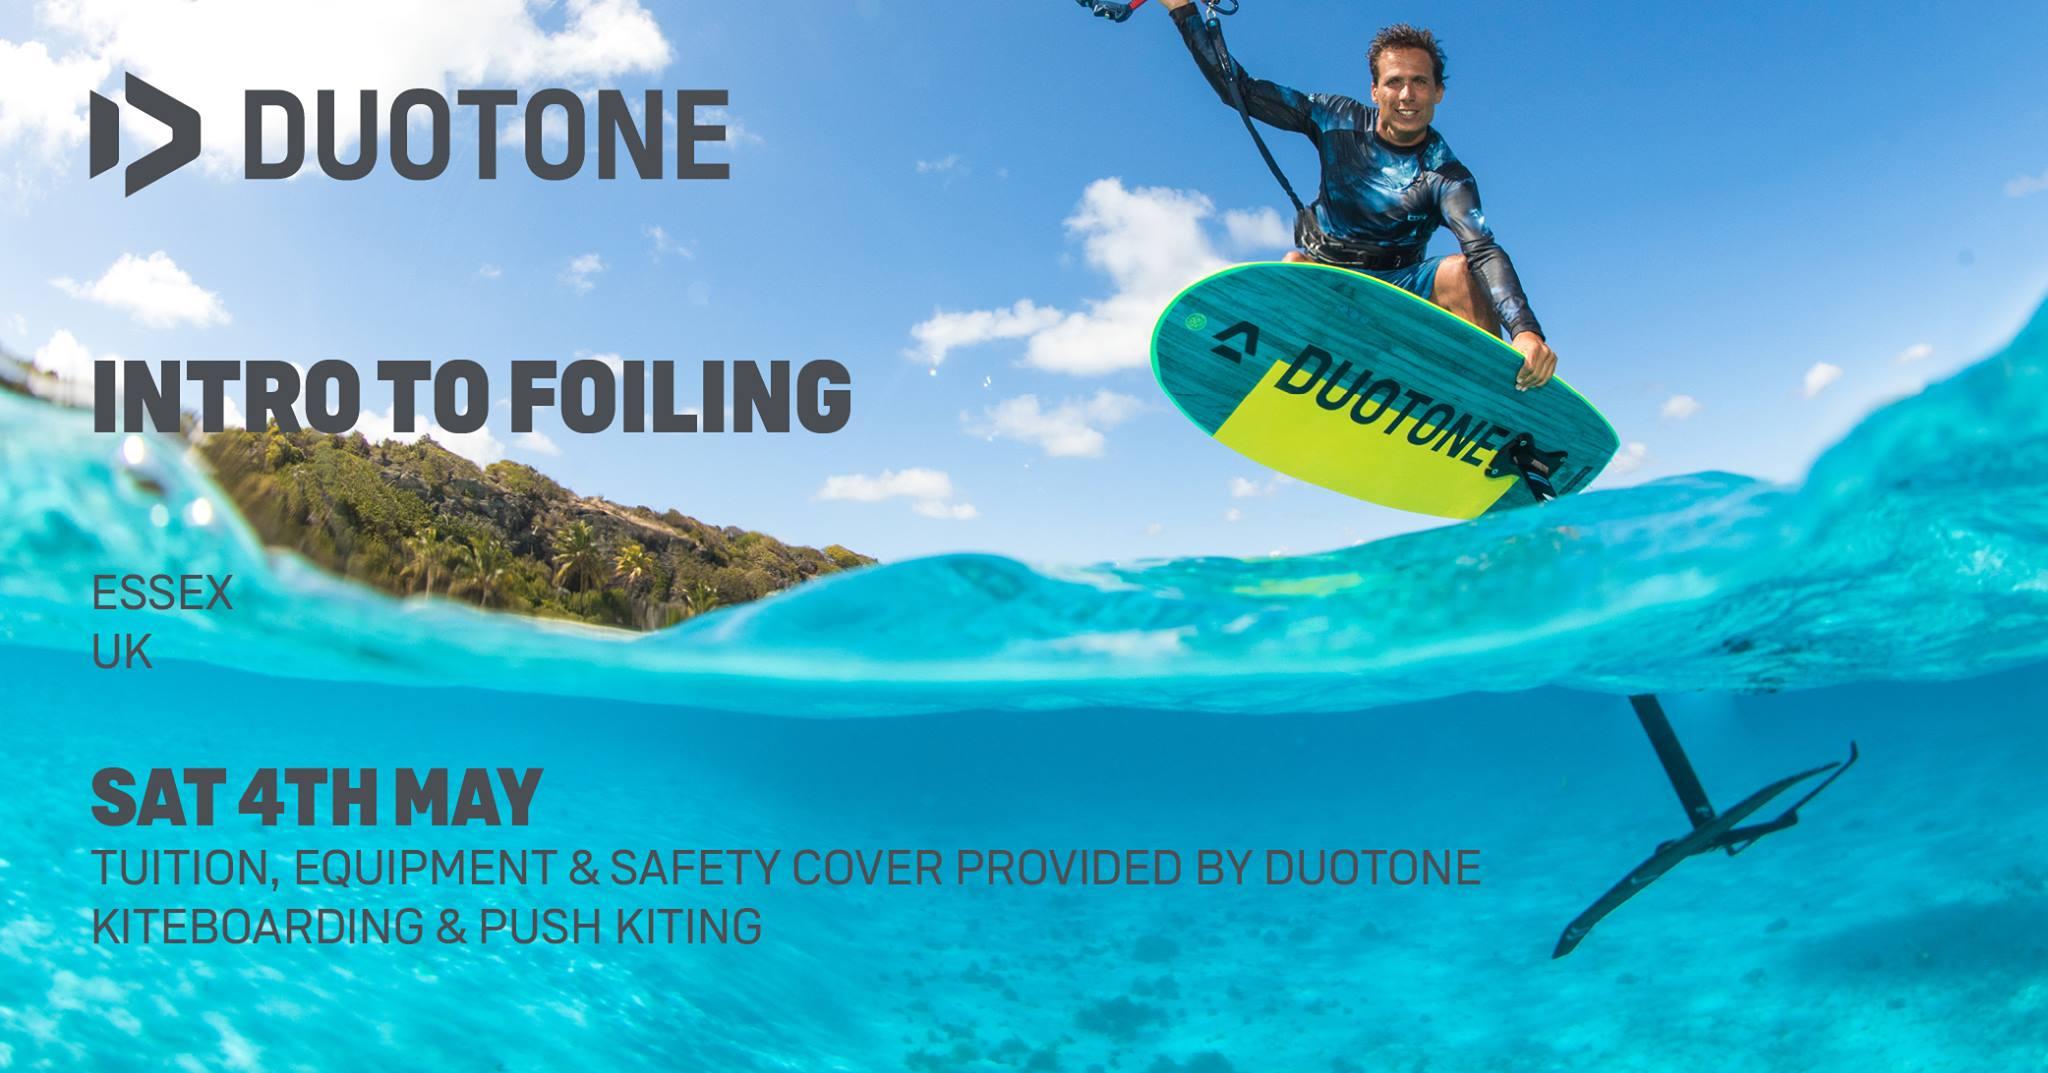 Duotone Hydrofoil Clinic in Essex – Free intro to Hydrofoiling